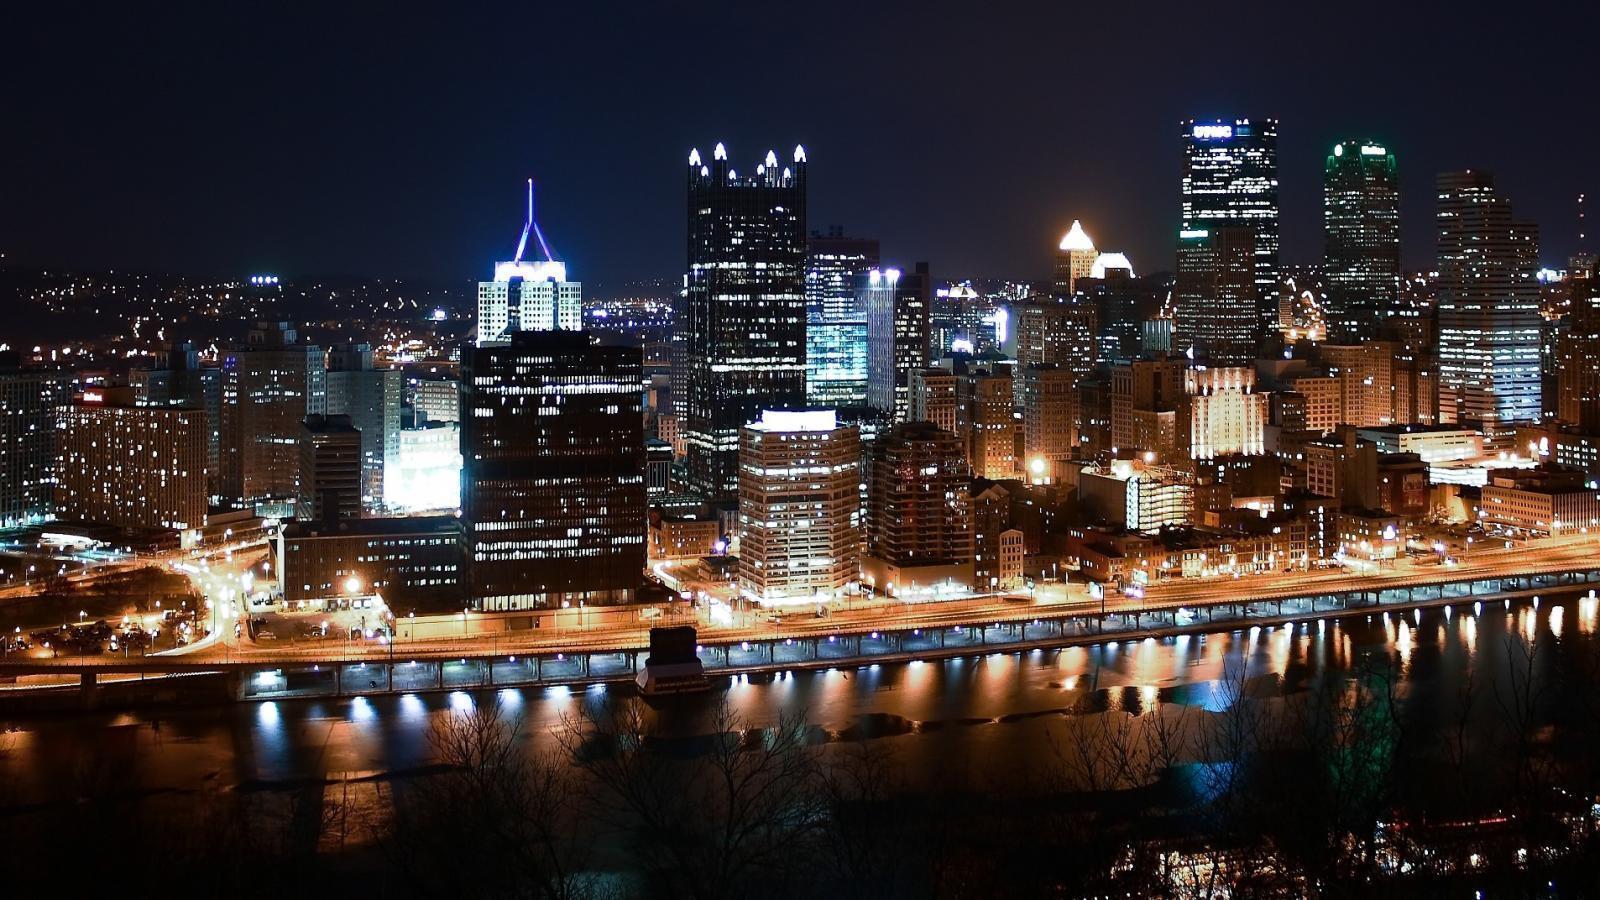 Pittsburgh Desktop Wallpaper Skyline: Pittsburgh Backgrounds